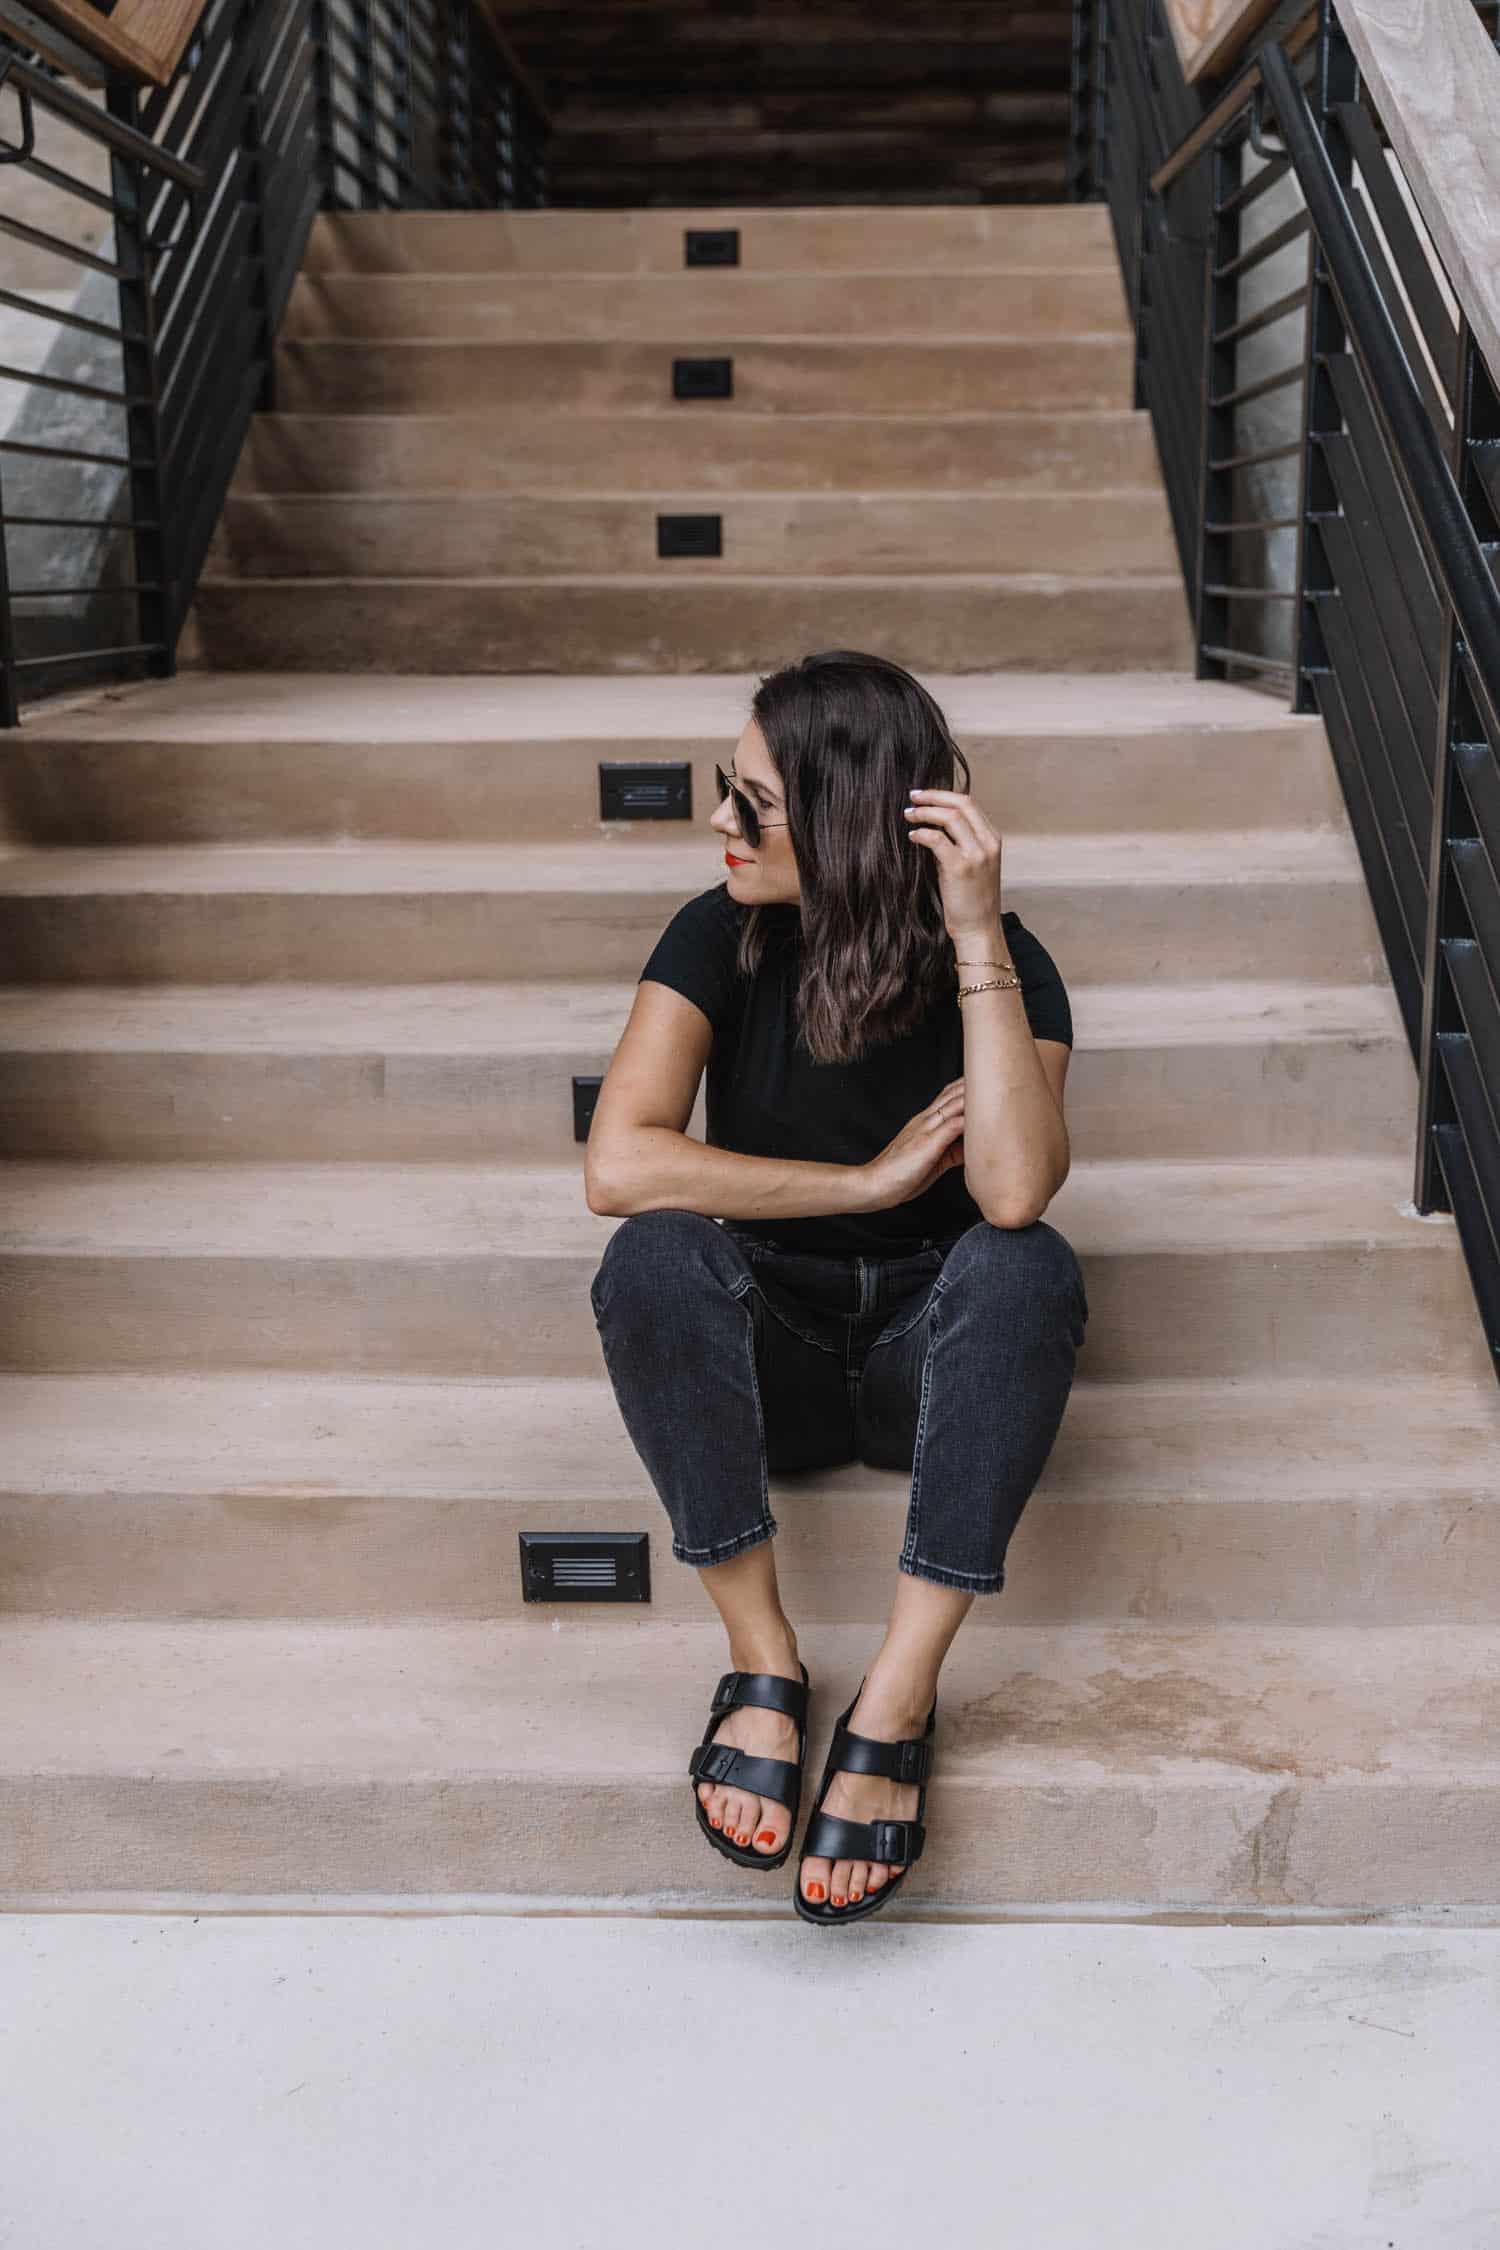 Jessica Camerata wears black jeans with black plastic birkenstocks